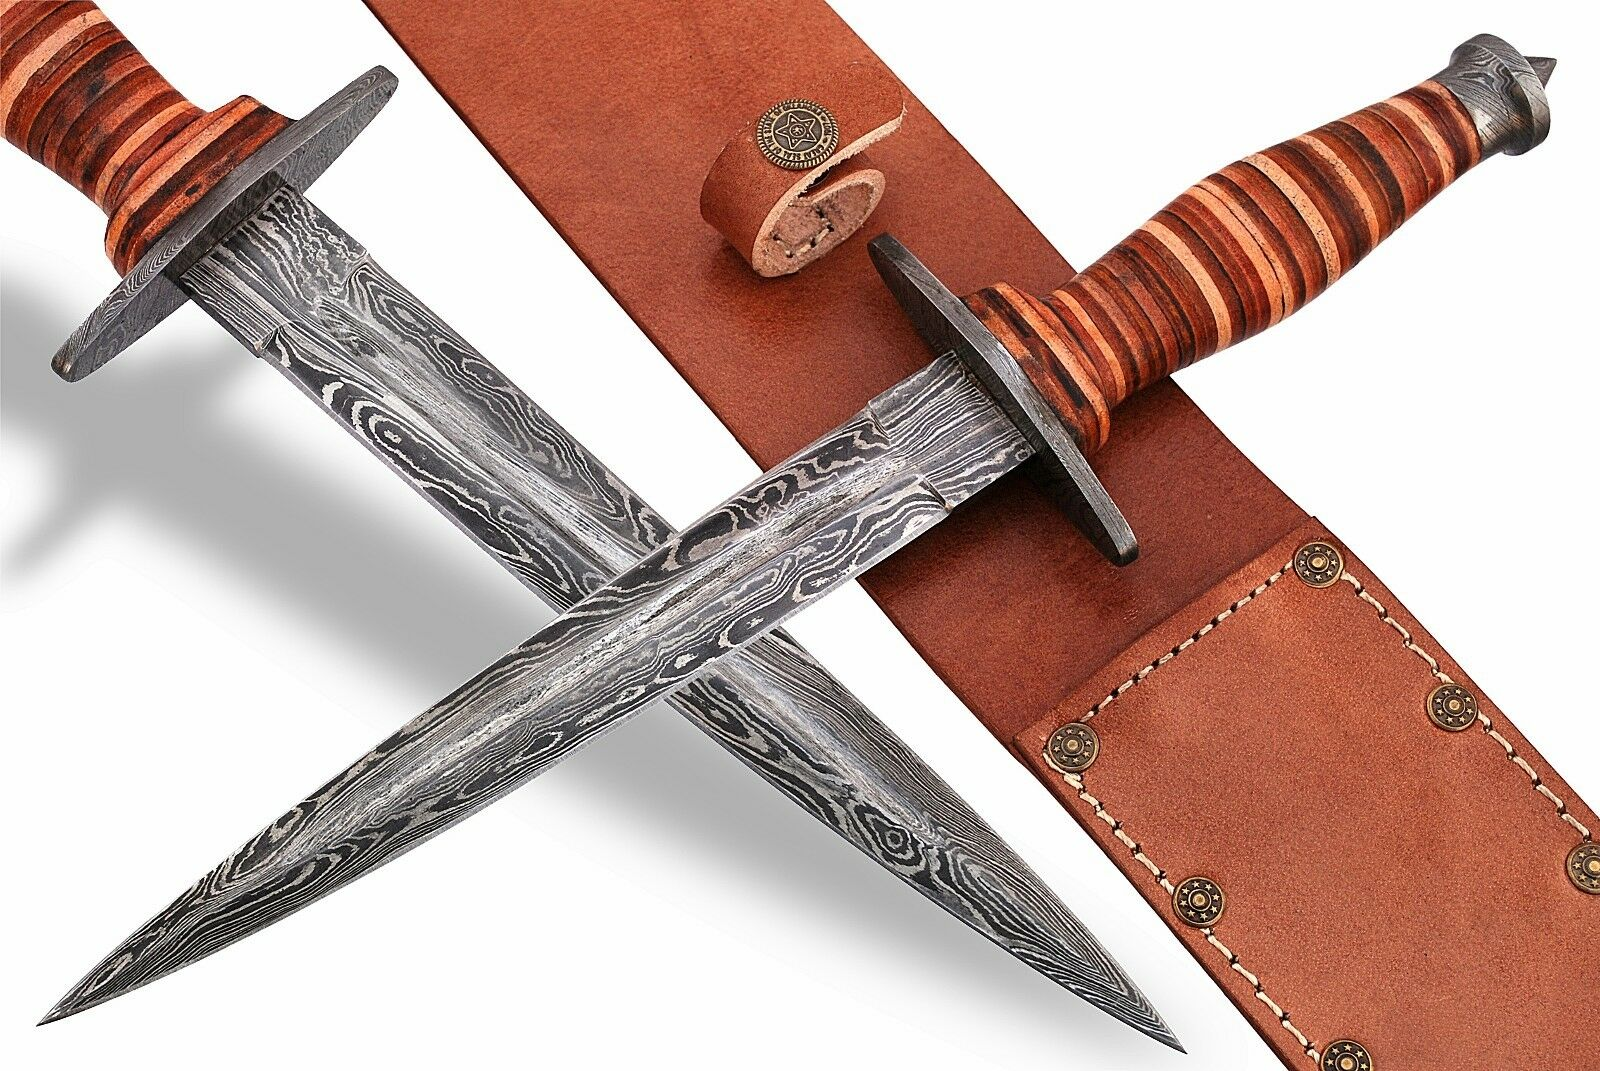 Réplica de la Segunda Guerra Mundial lucha Stiletto Daga De Combate, Hoja De Acero Damasco, Cuero Handl